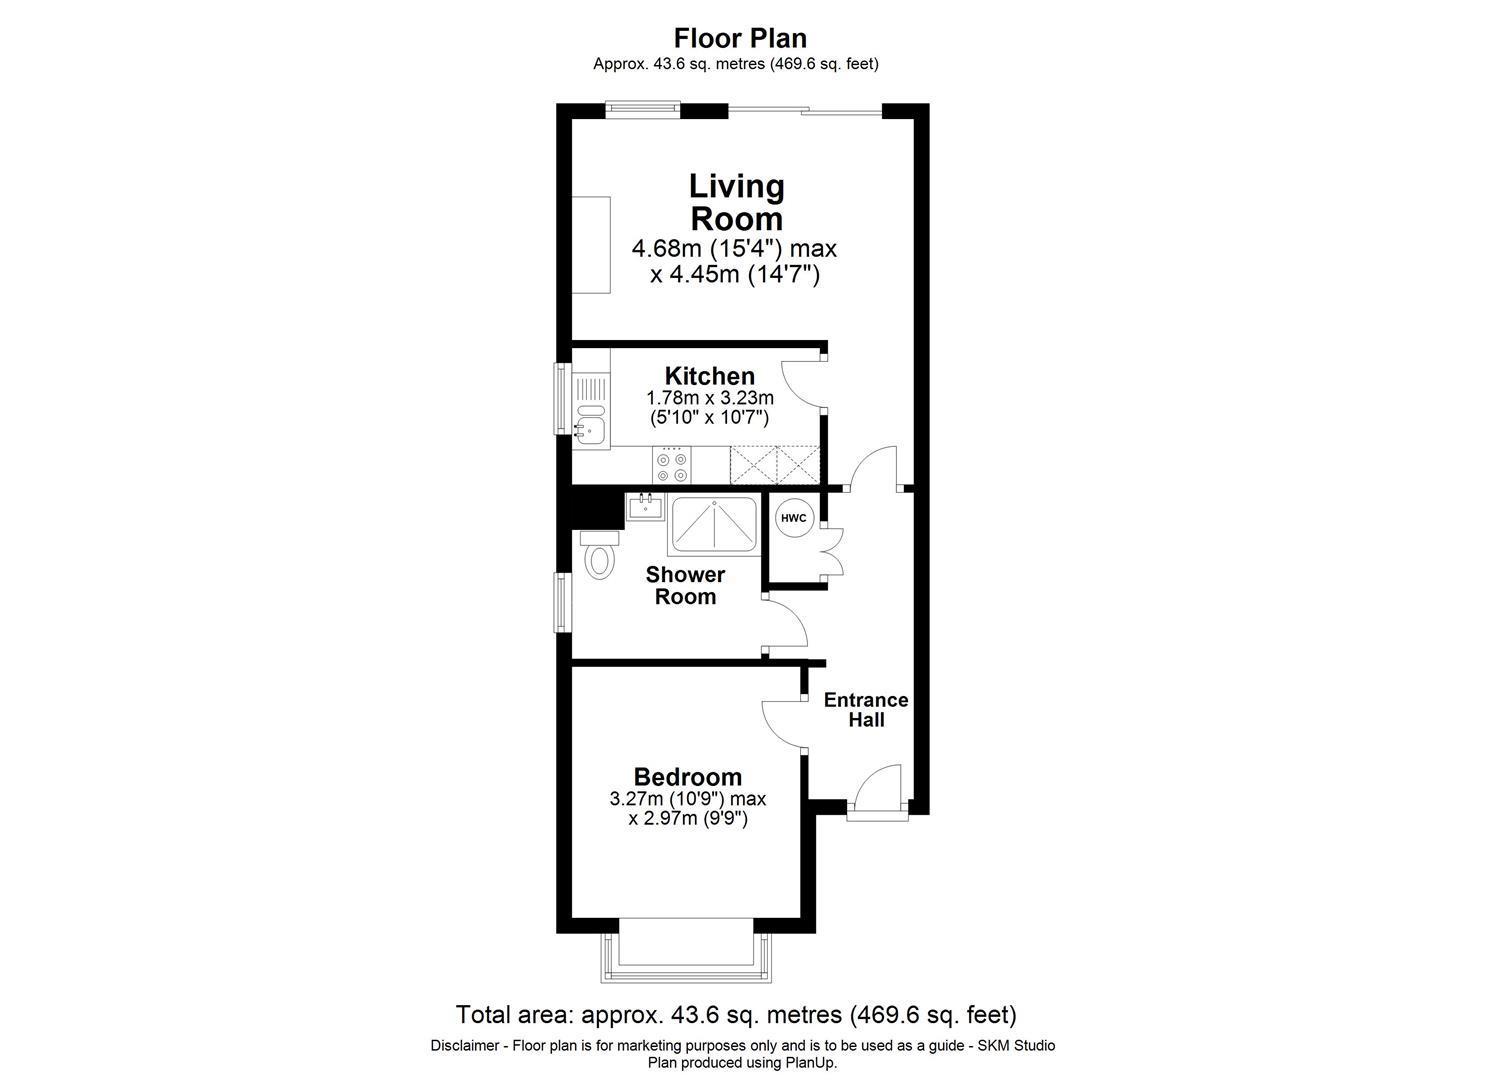 27-EMERTON-GARTH_-NORTHCHURCH_- floor plan.jpg